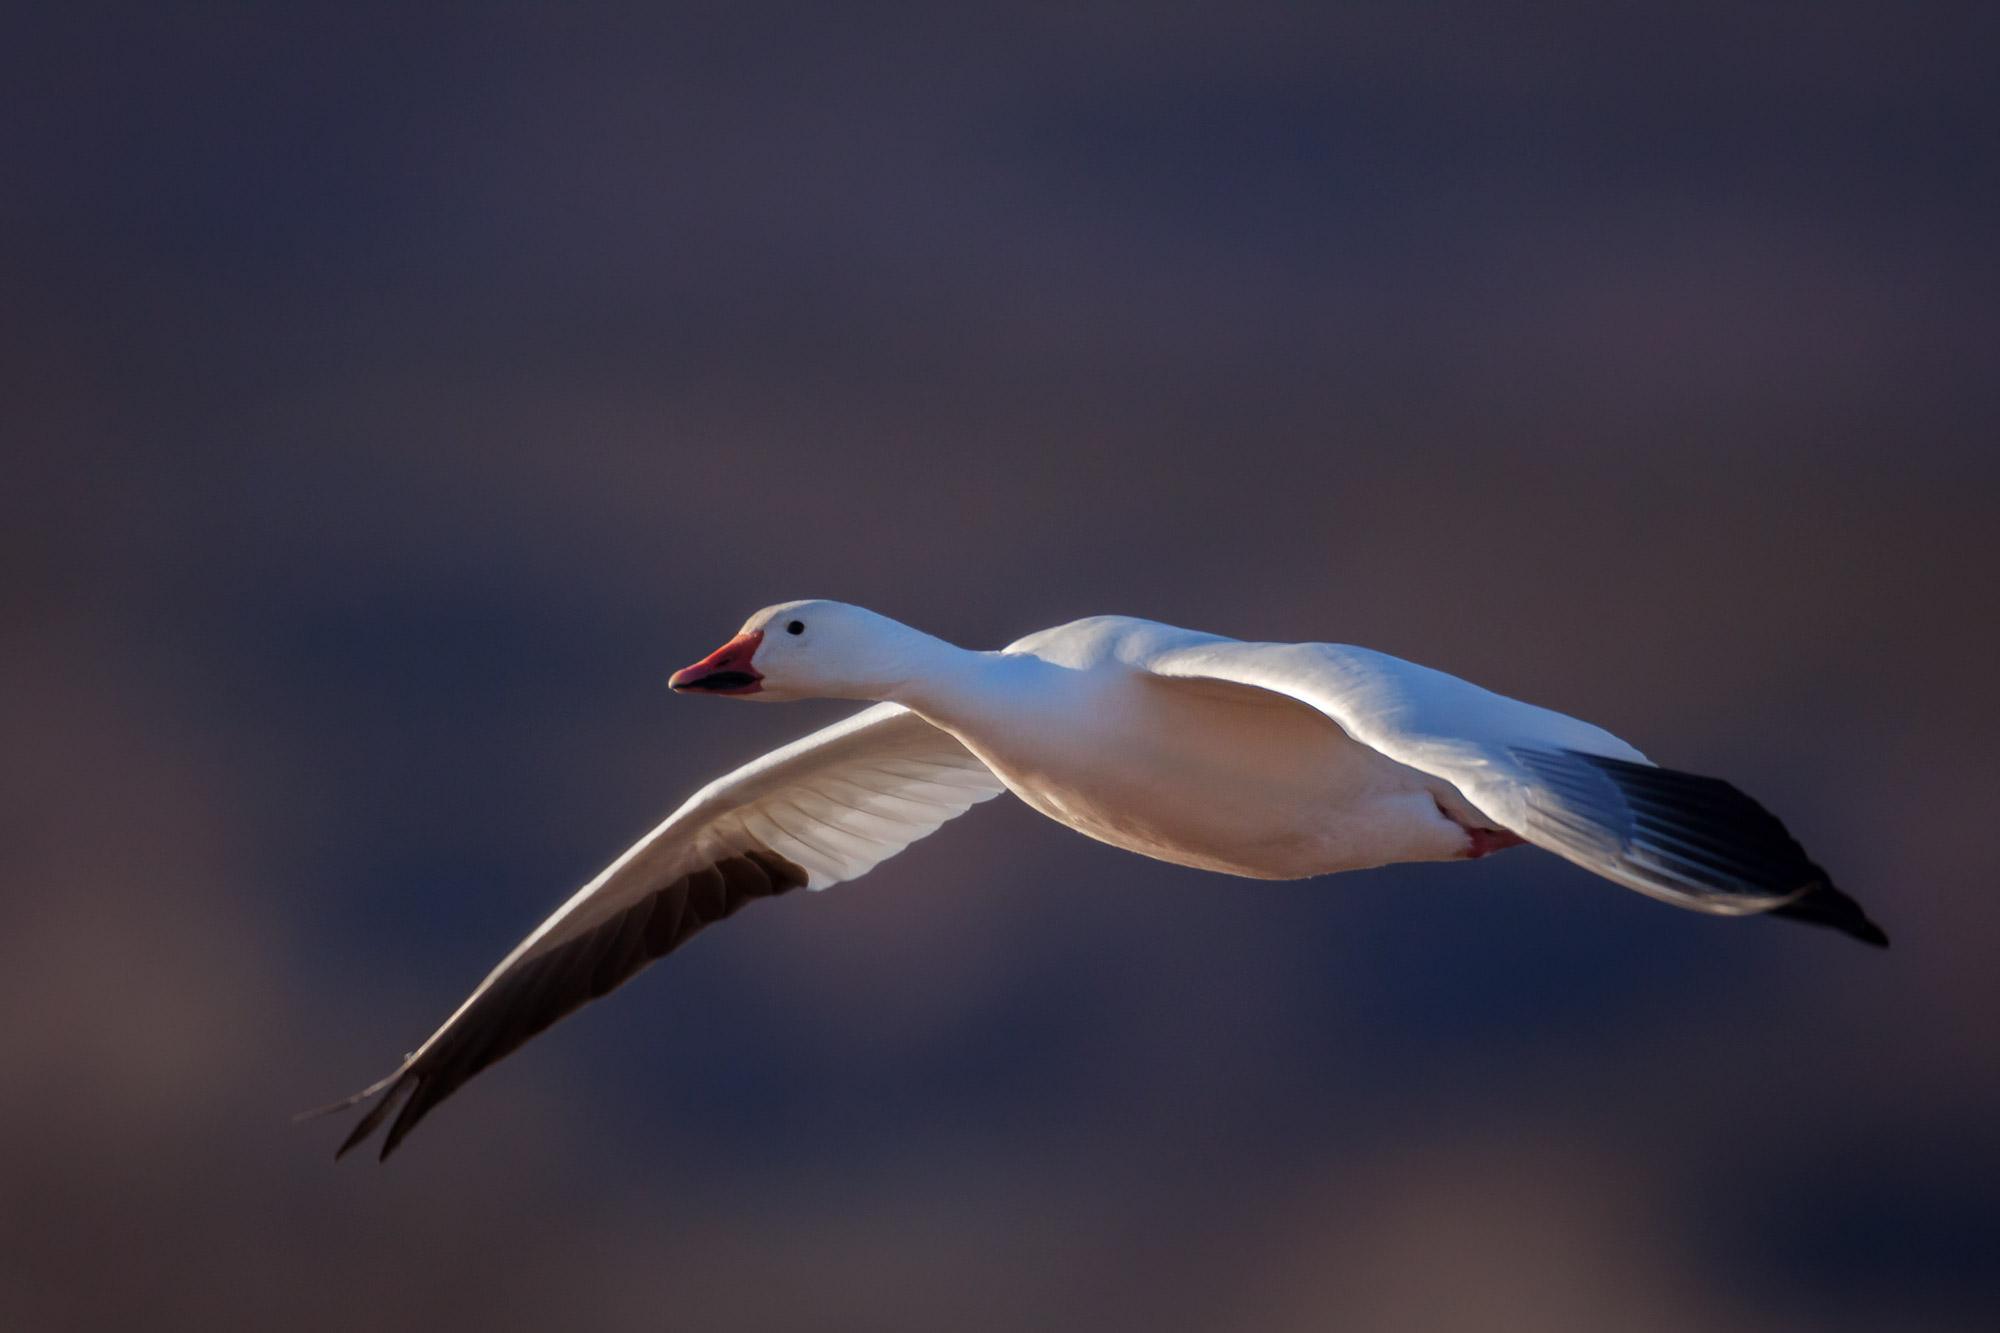 Goose, Snow Goose, New Mexico, Bosque del Apache, limited edition, photograph, fine art, wildlife, photo